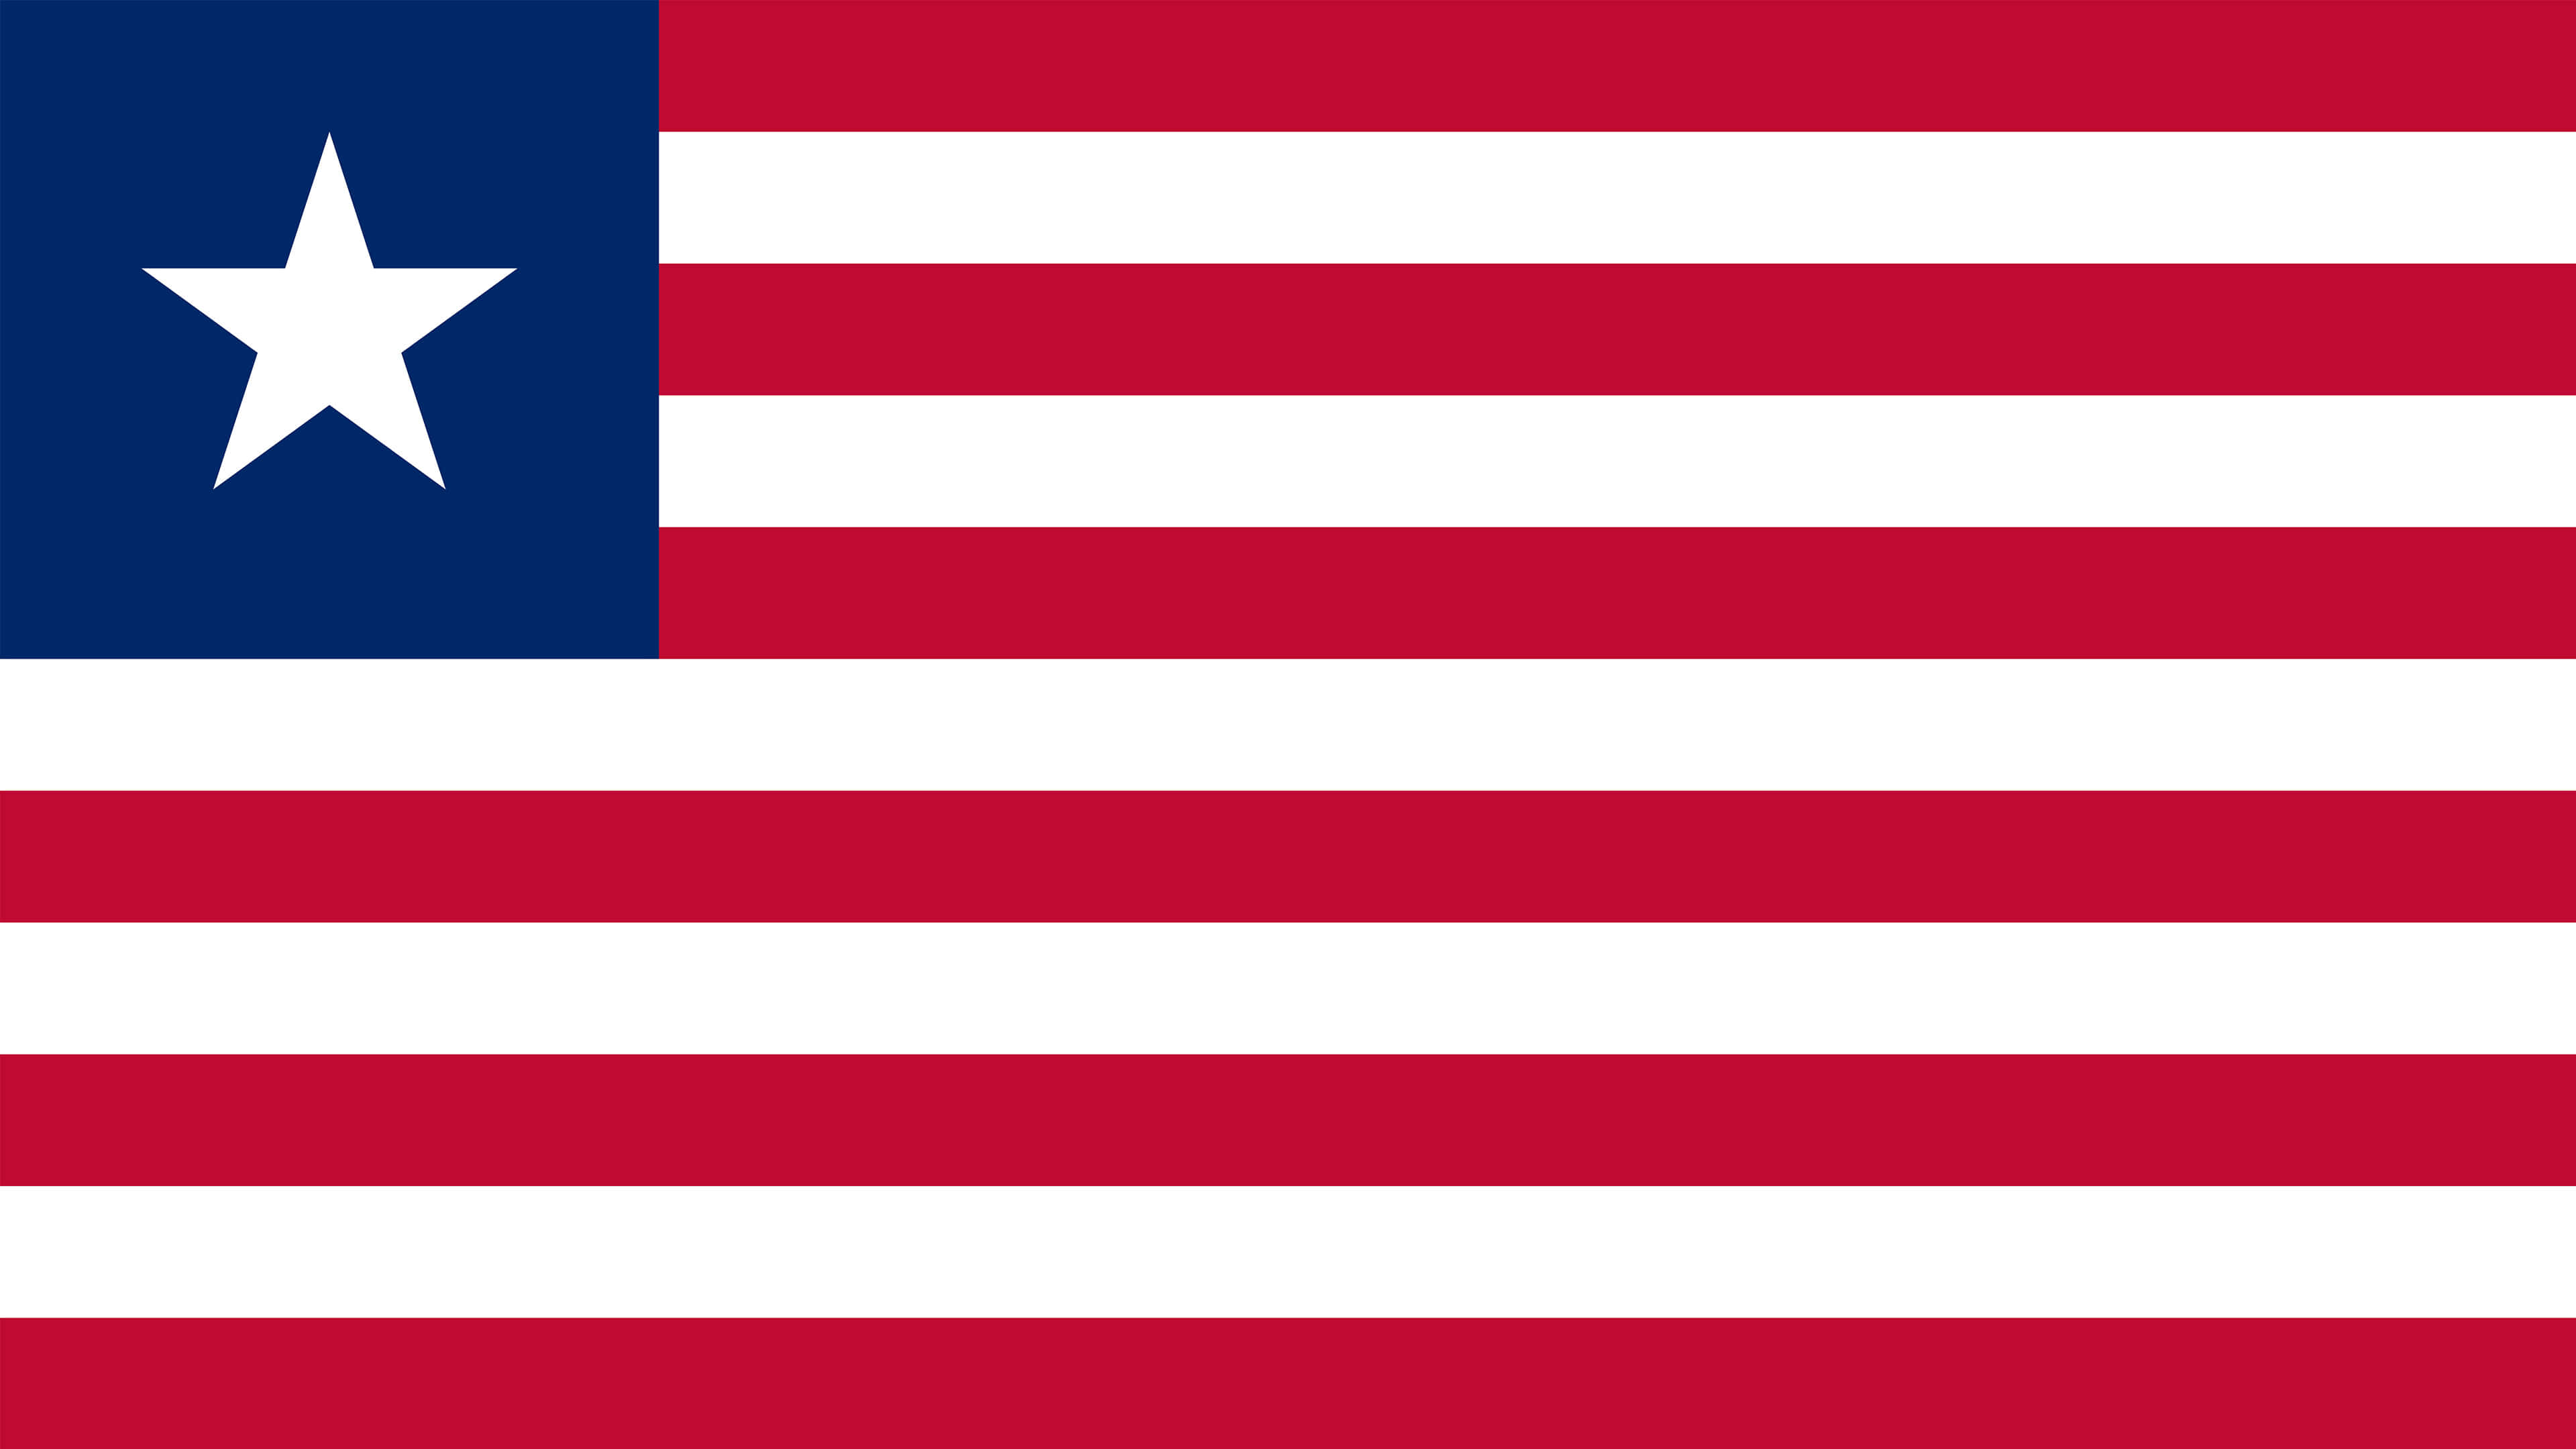 liberia flag uhd 4k wallpaper